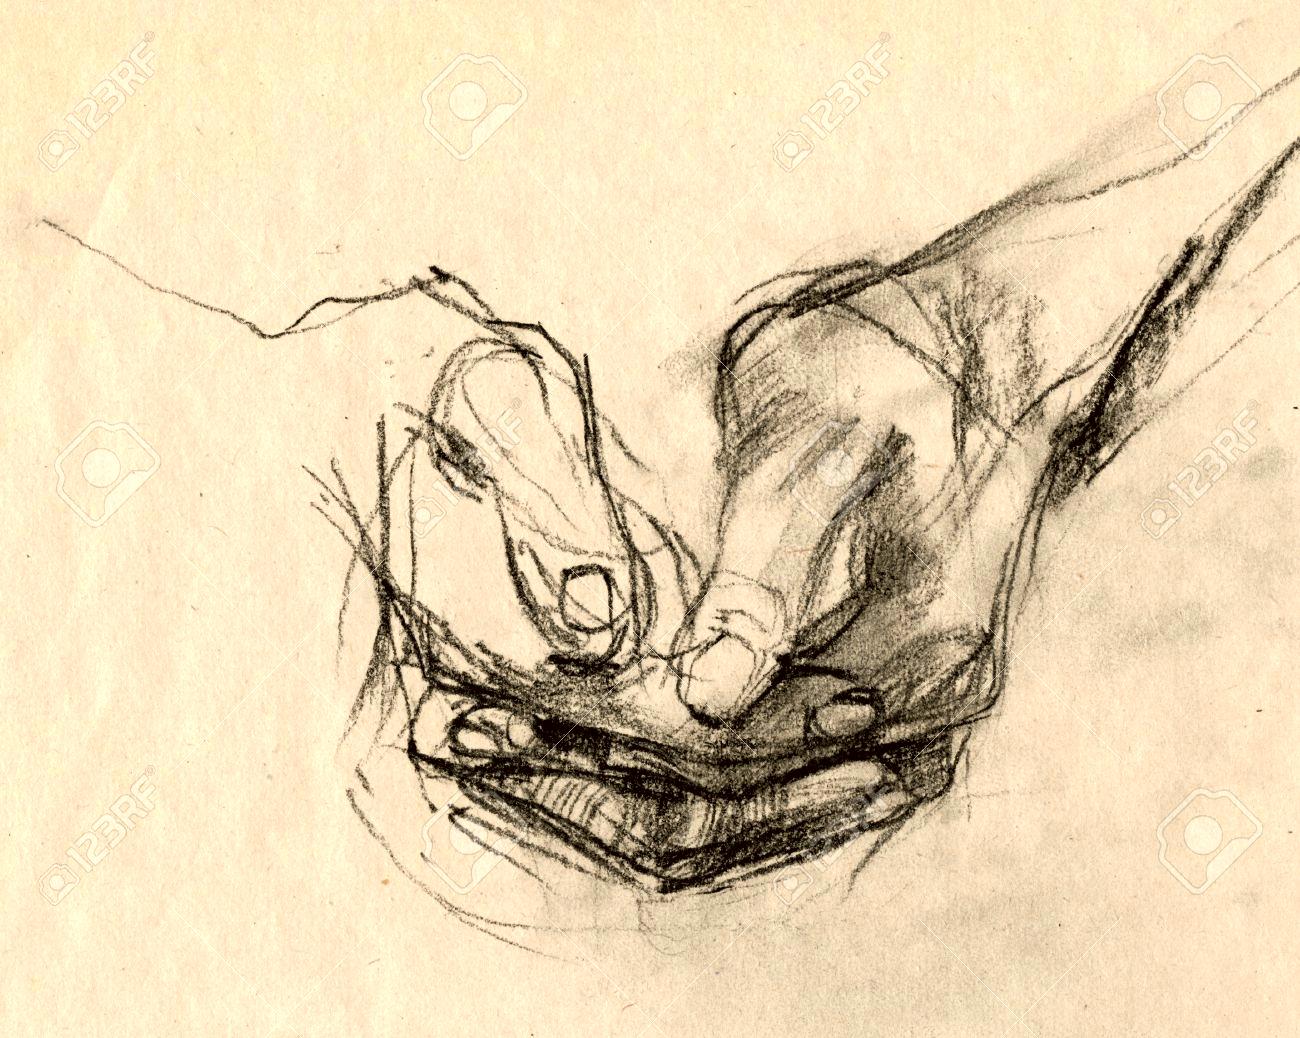 ' SEATED NUDE BOY SEEN FROM THE BACK', Giovanni Francesco Barbieri, called Guercino, Bologna, 1591 - 1666